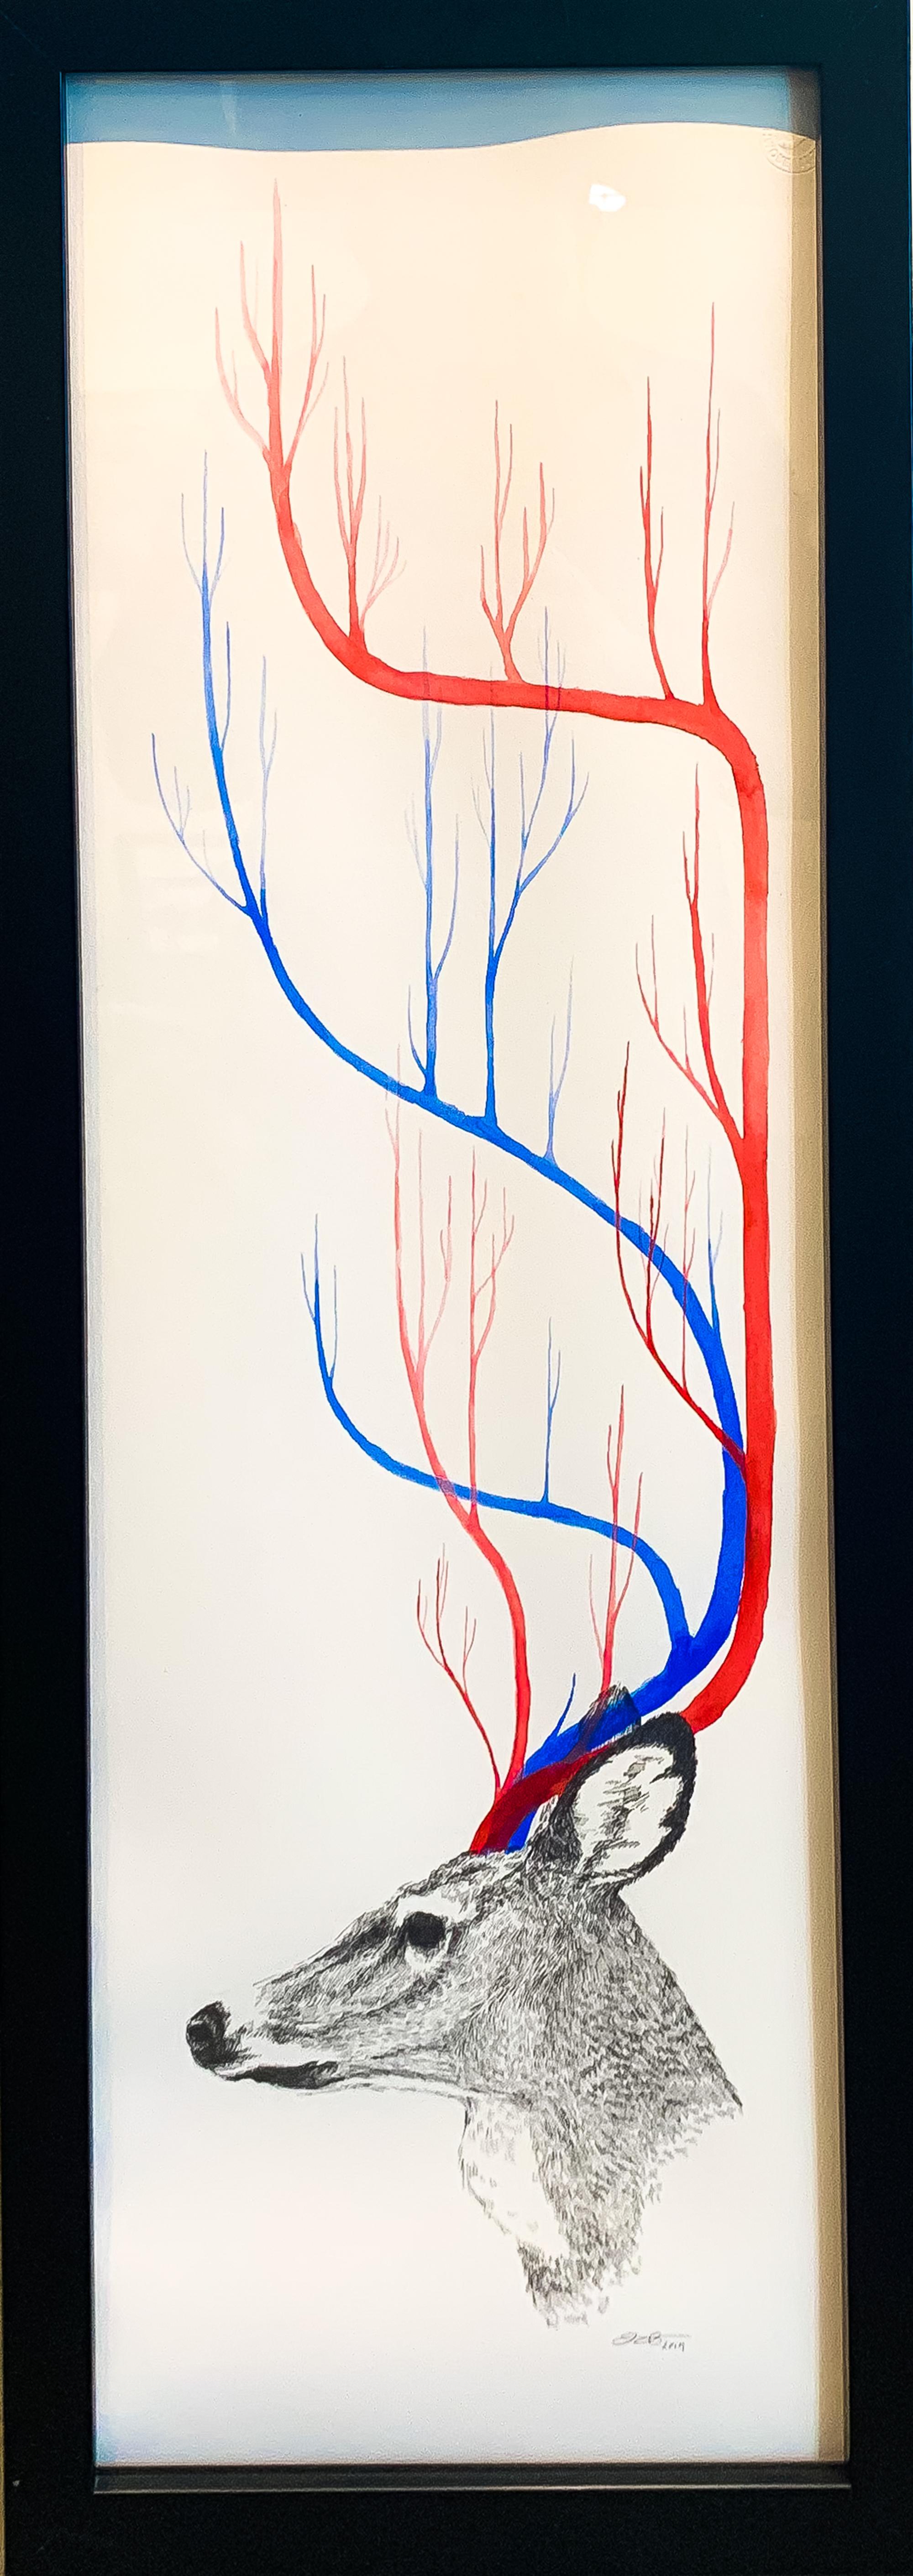 Veindeer No.8 by Jill Hakala